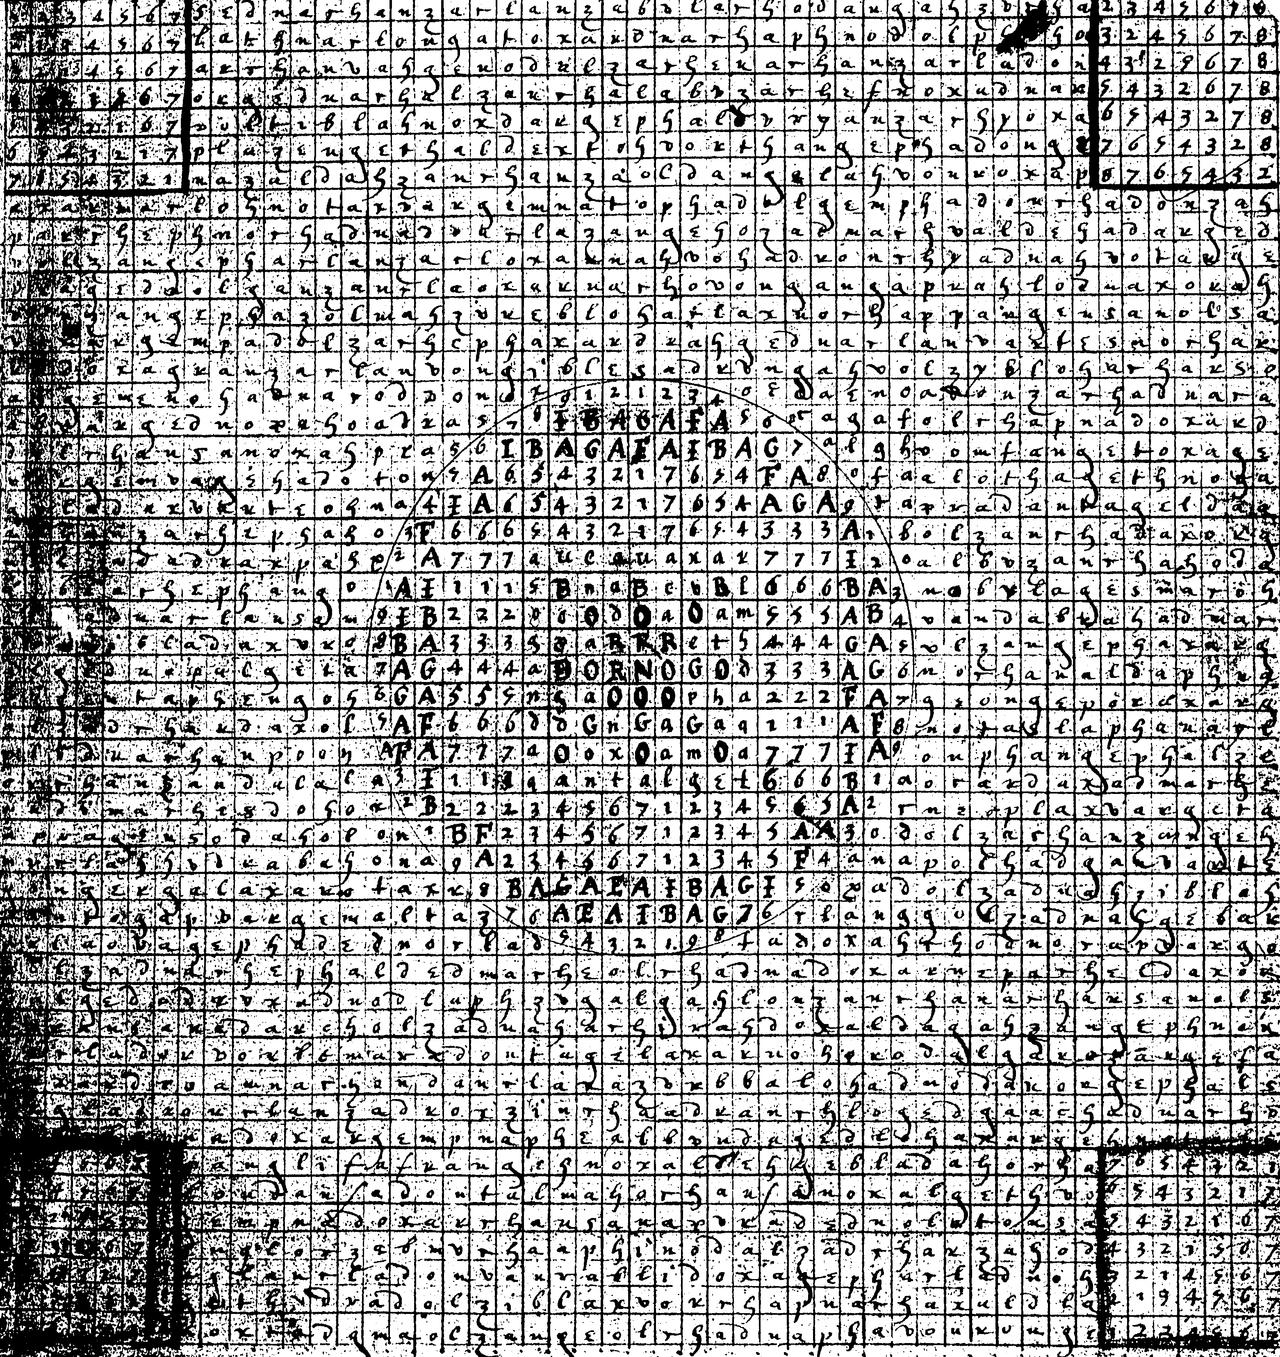 Exemple avec le <i>Liber Logaeth</i>, 101 grilles formant un livre, la plupart composés de 49◊49 lignes.